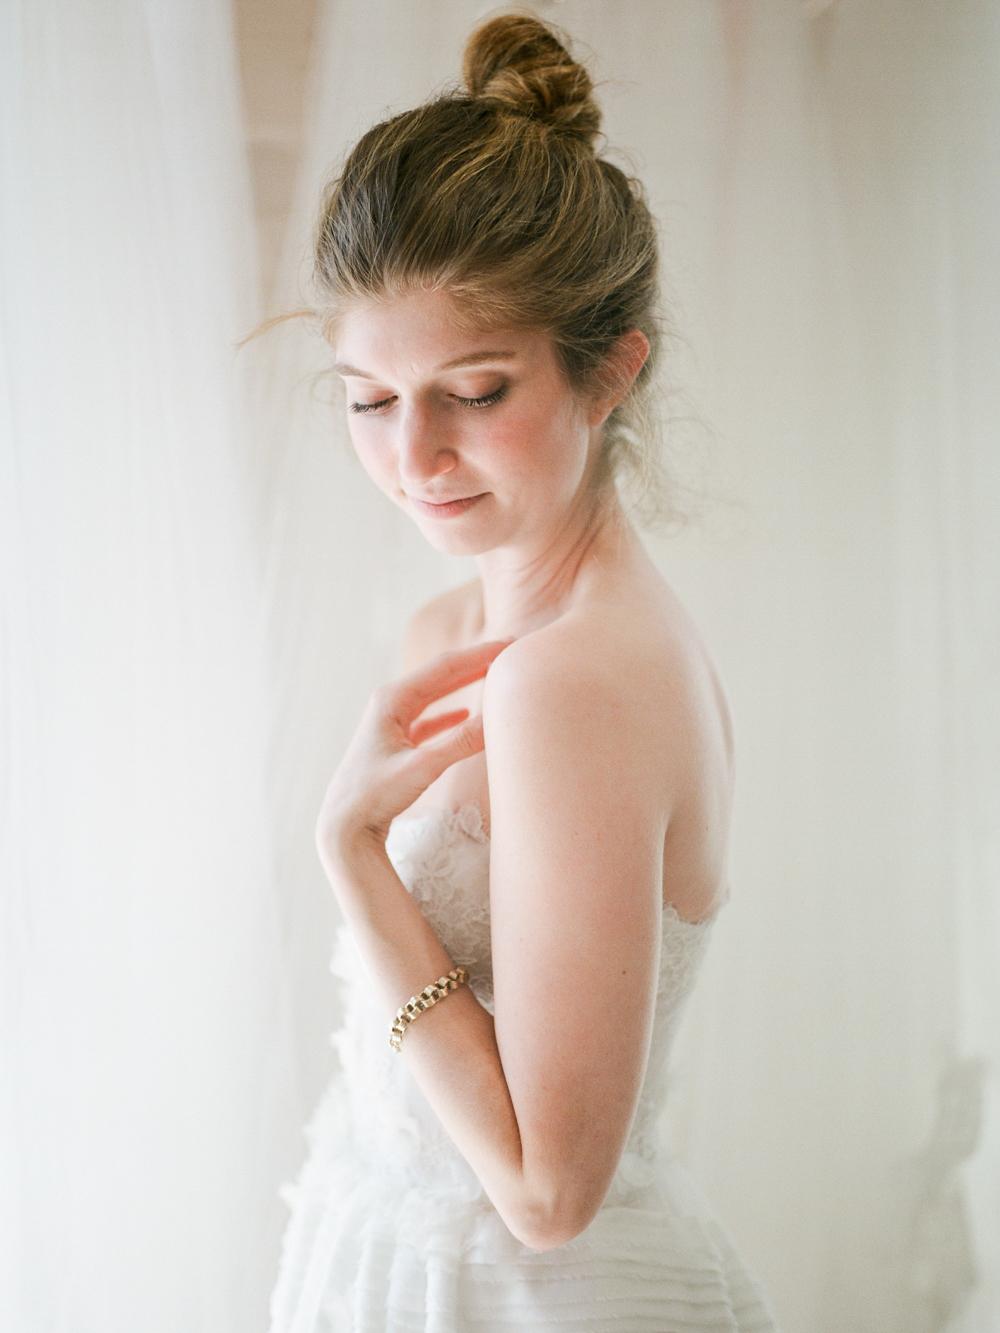 Christine Gosch - destination film photographer - houston wedding photographer - fine art film photographer - elopement photographer - destination wedding - understated wedding - simple beautiful wedding photography-16.jpg